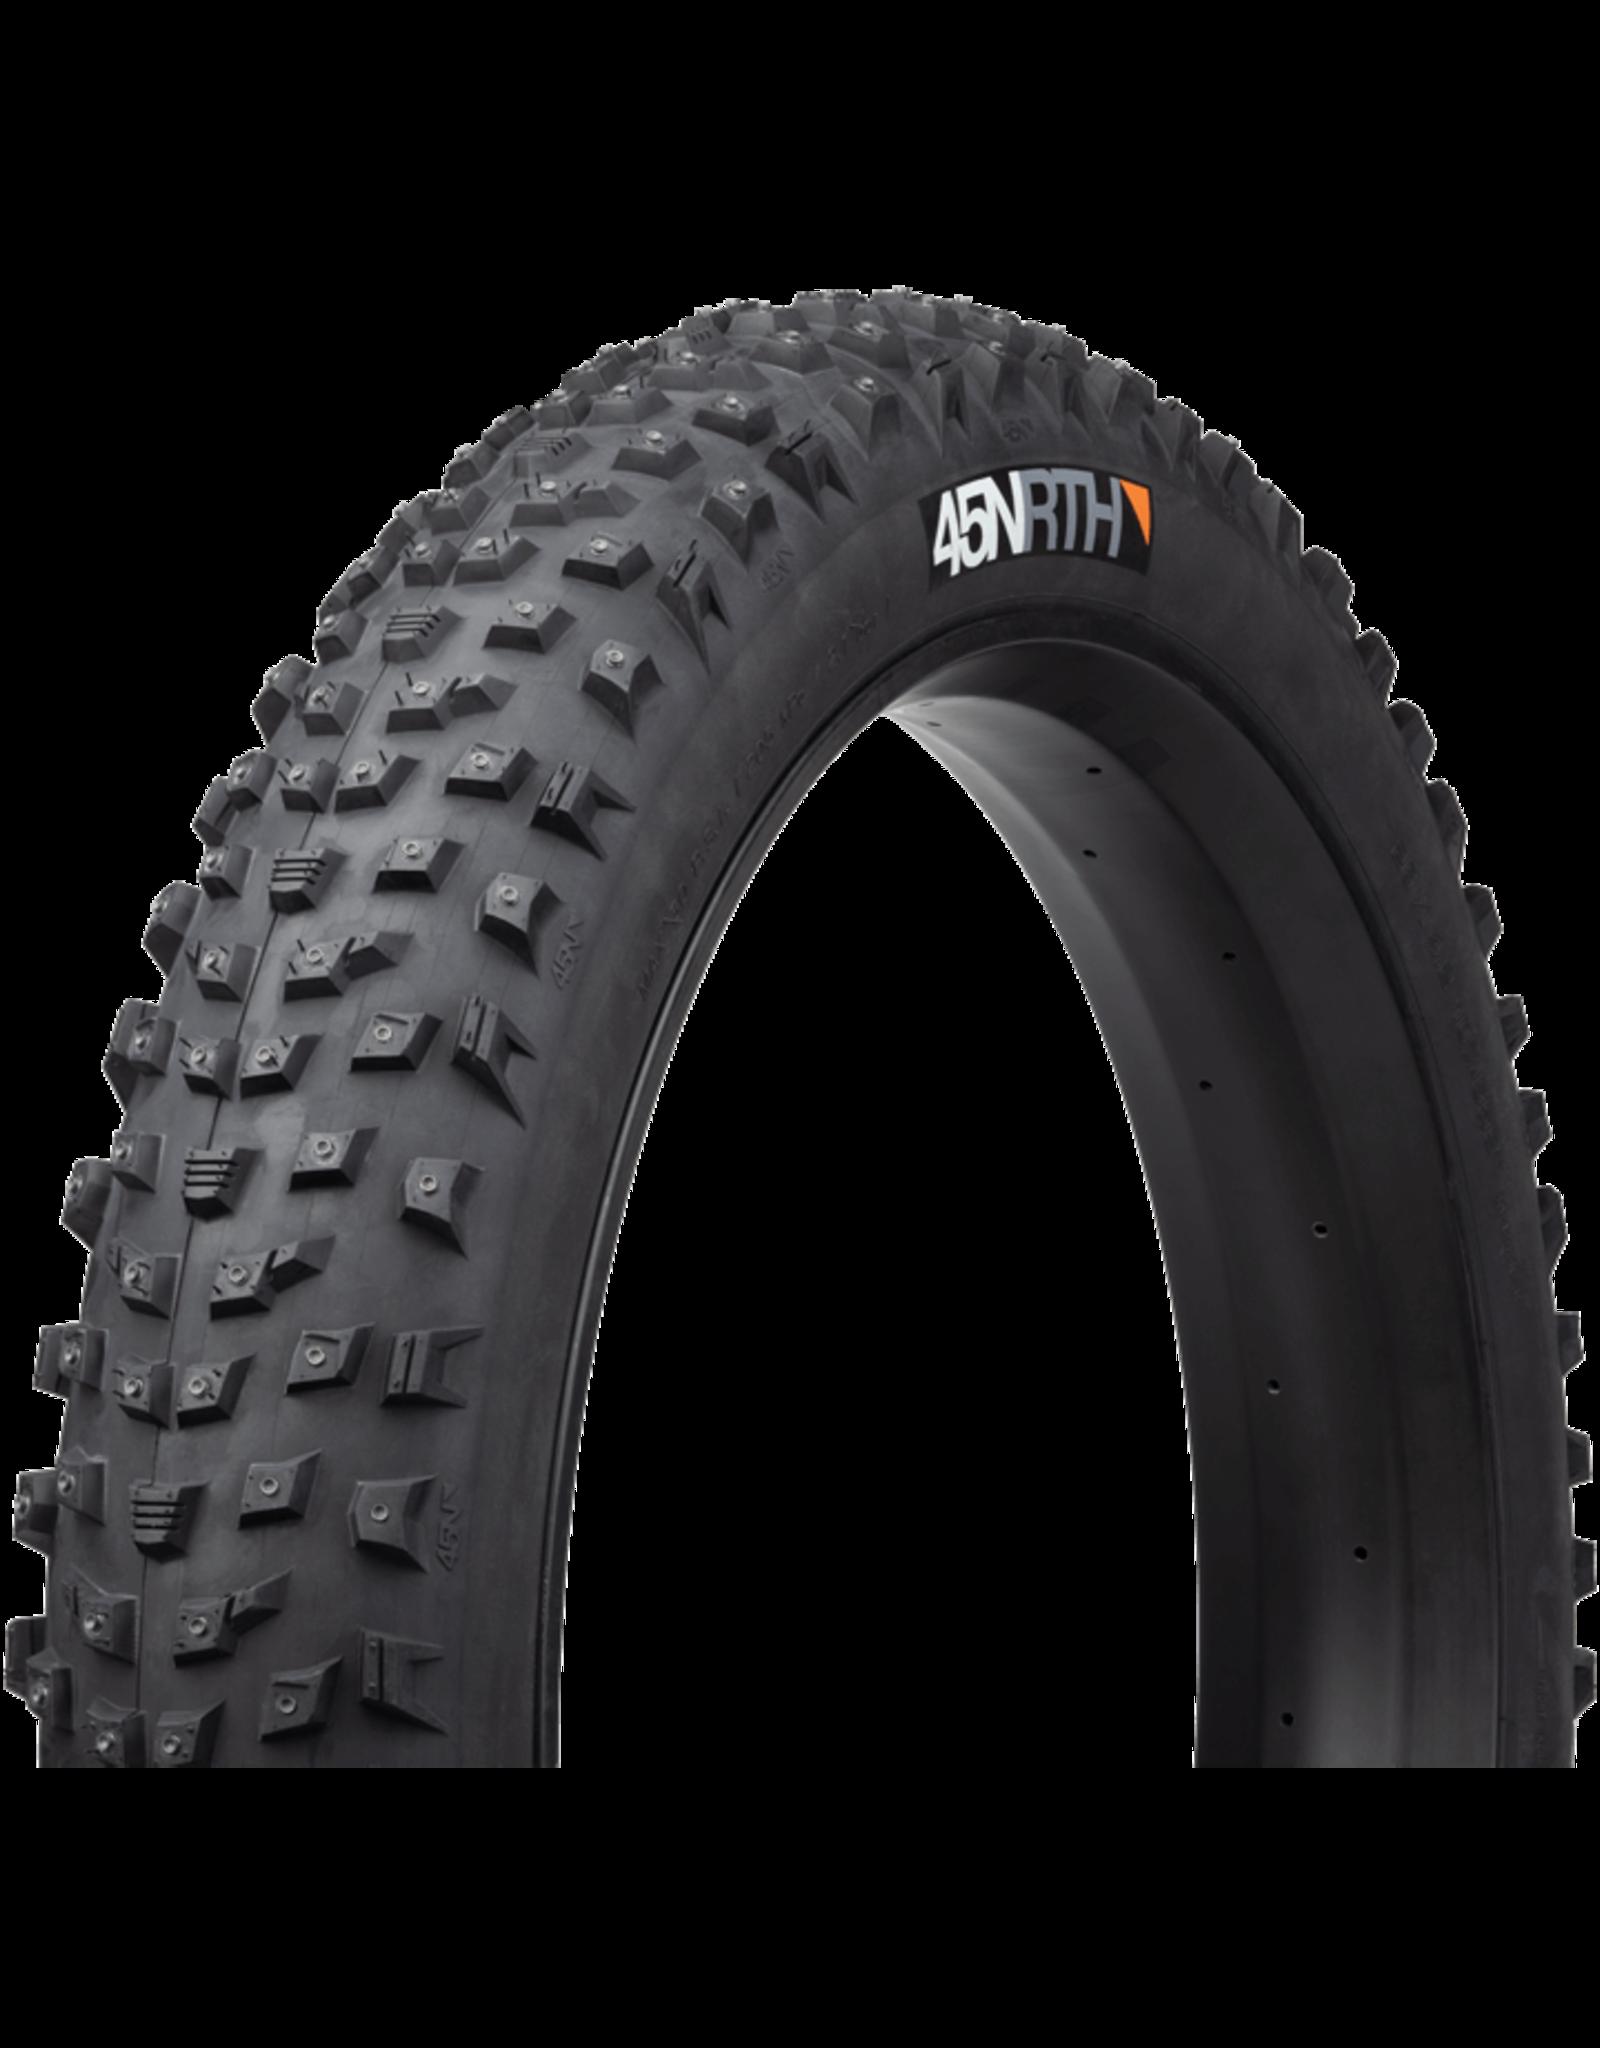 45NRTH 26x4.2 Wrathlorde 45NRTH Tire, TR, Folding, Black, 120tpi, 300 XL Concave Carbide Aluminum Studs